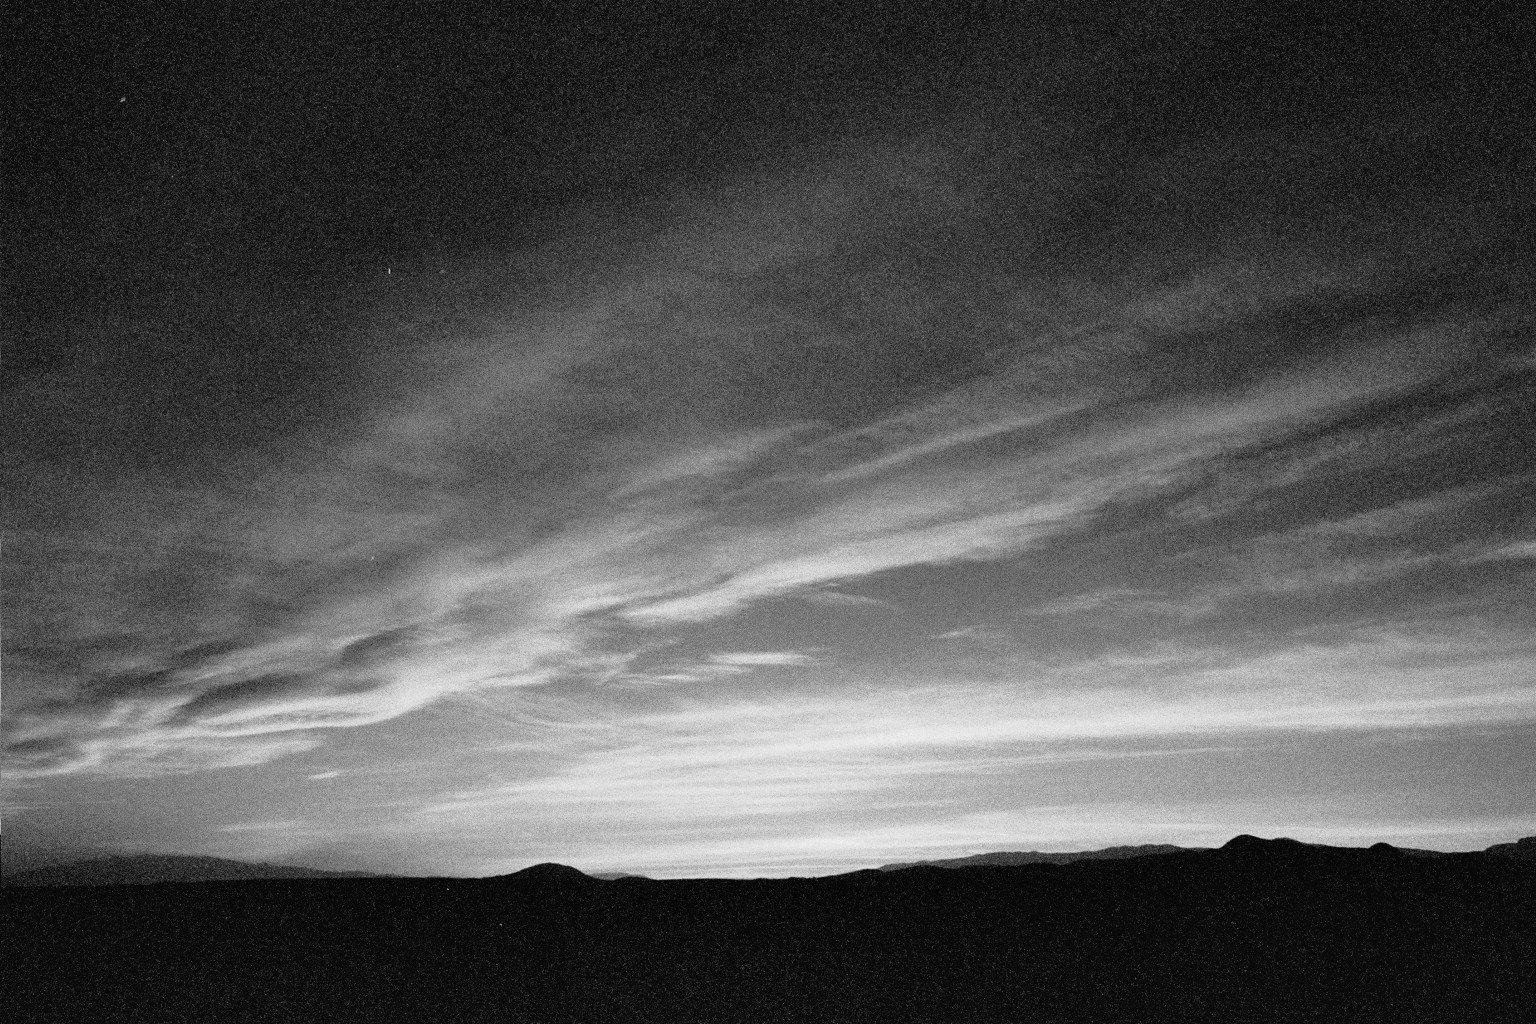 sunset grainey 15.jpg